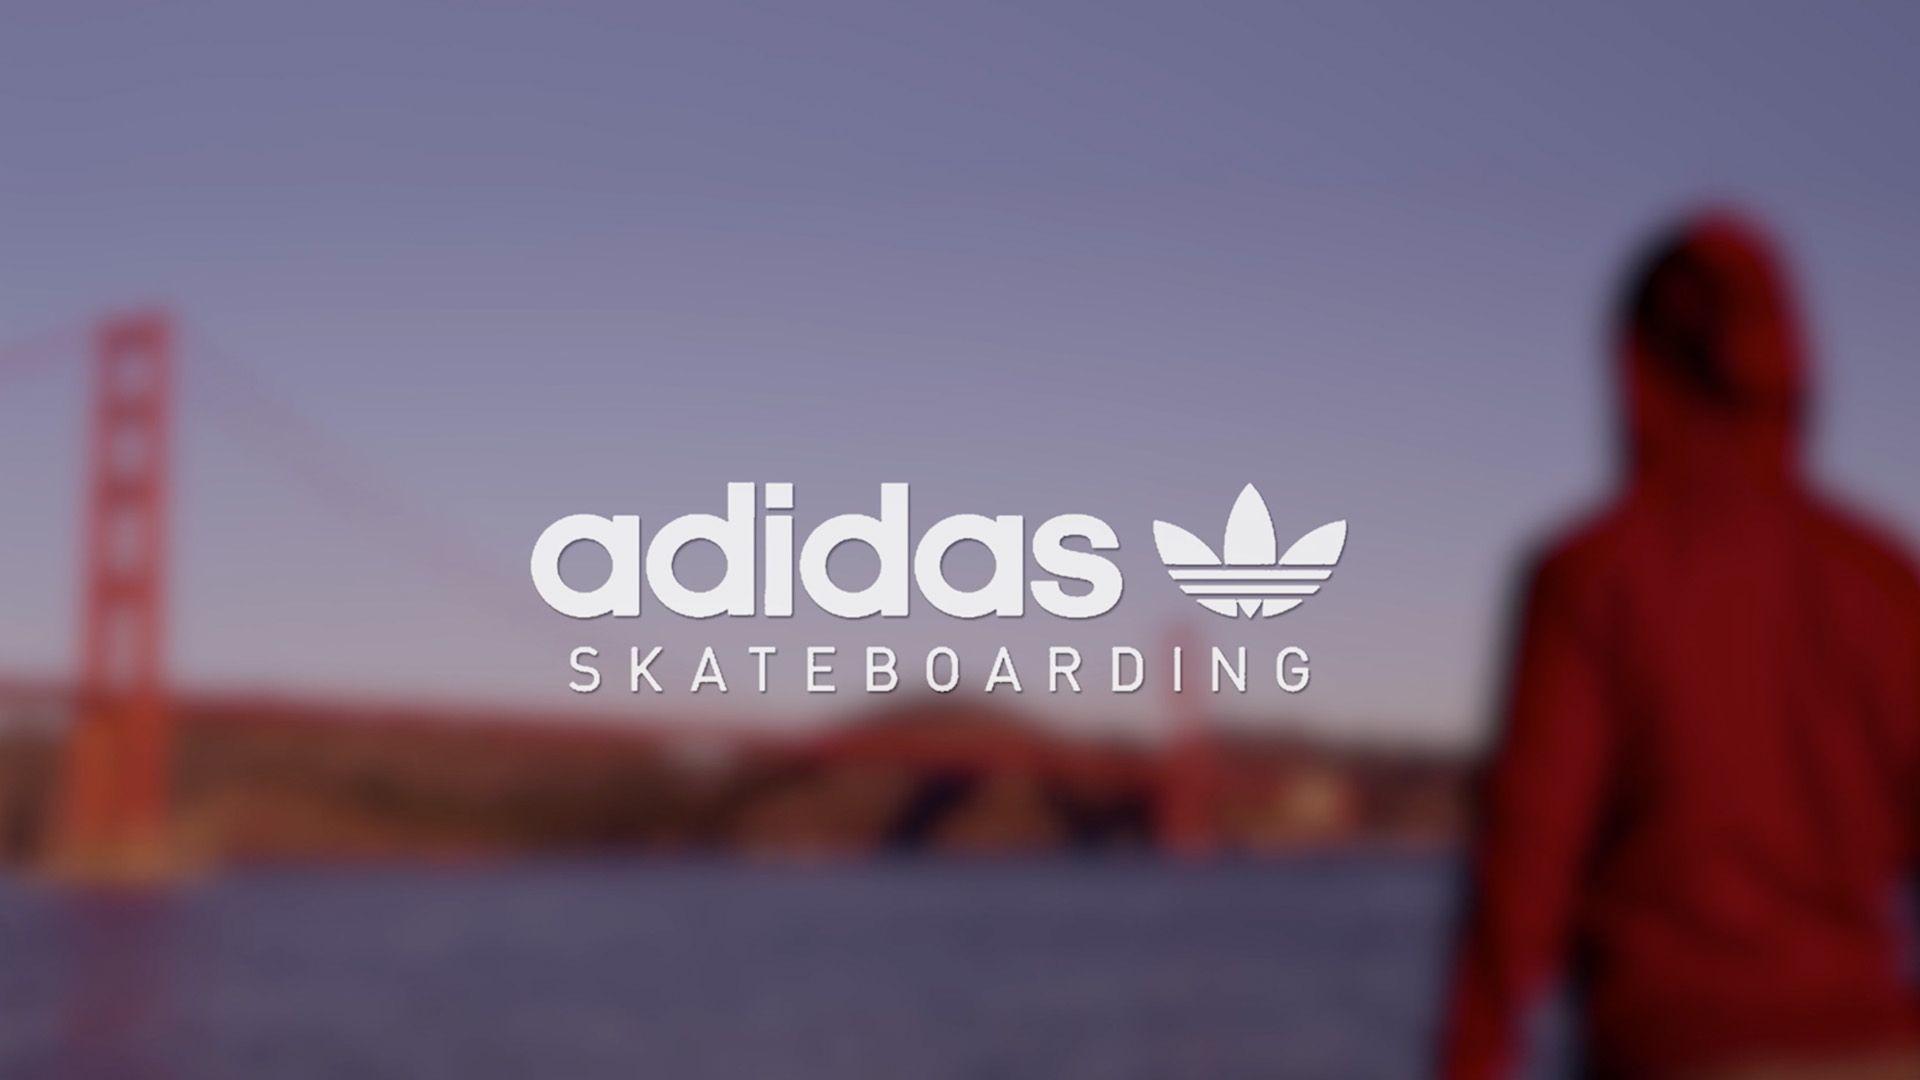 Adidas Skateboarding Wallpaper 50 Images